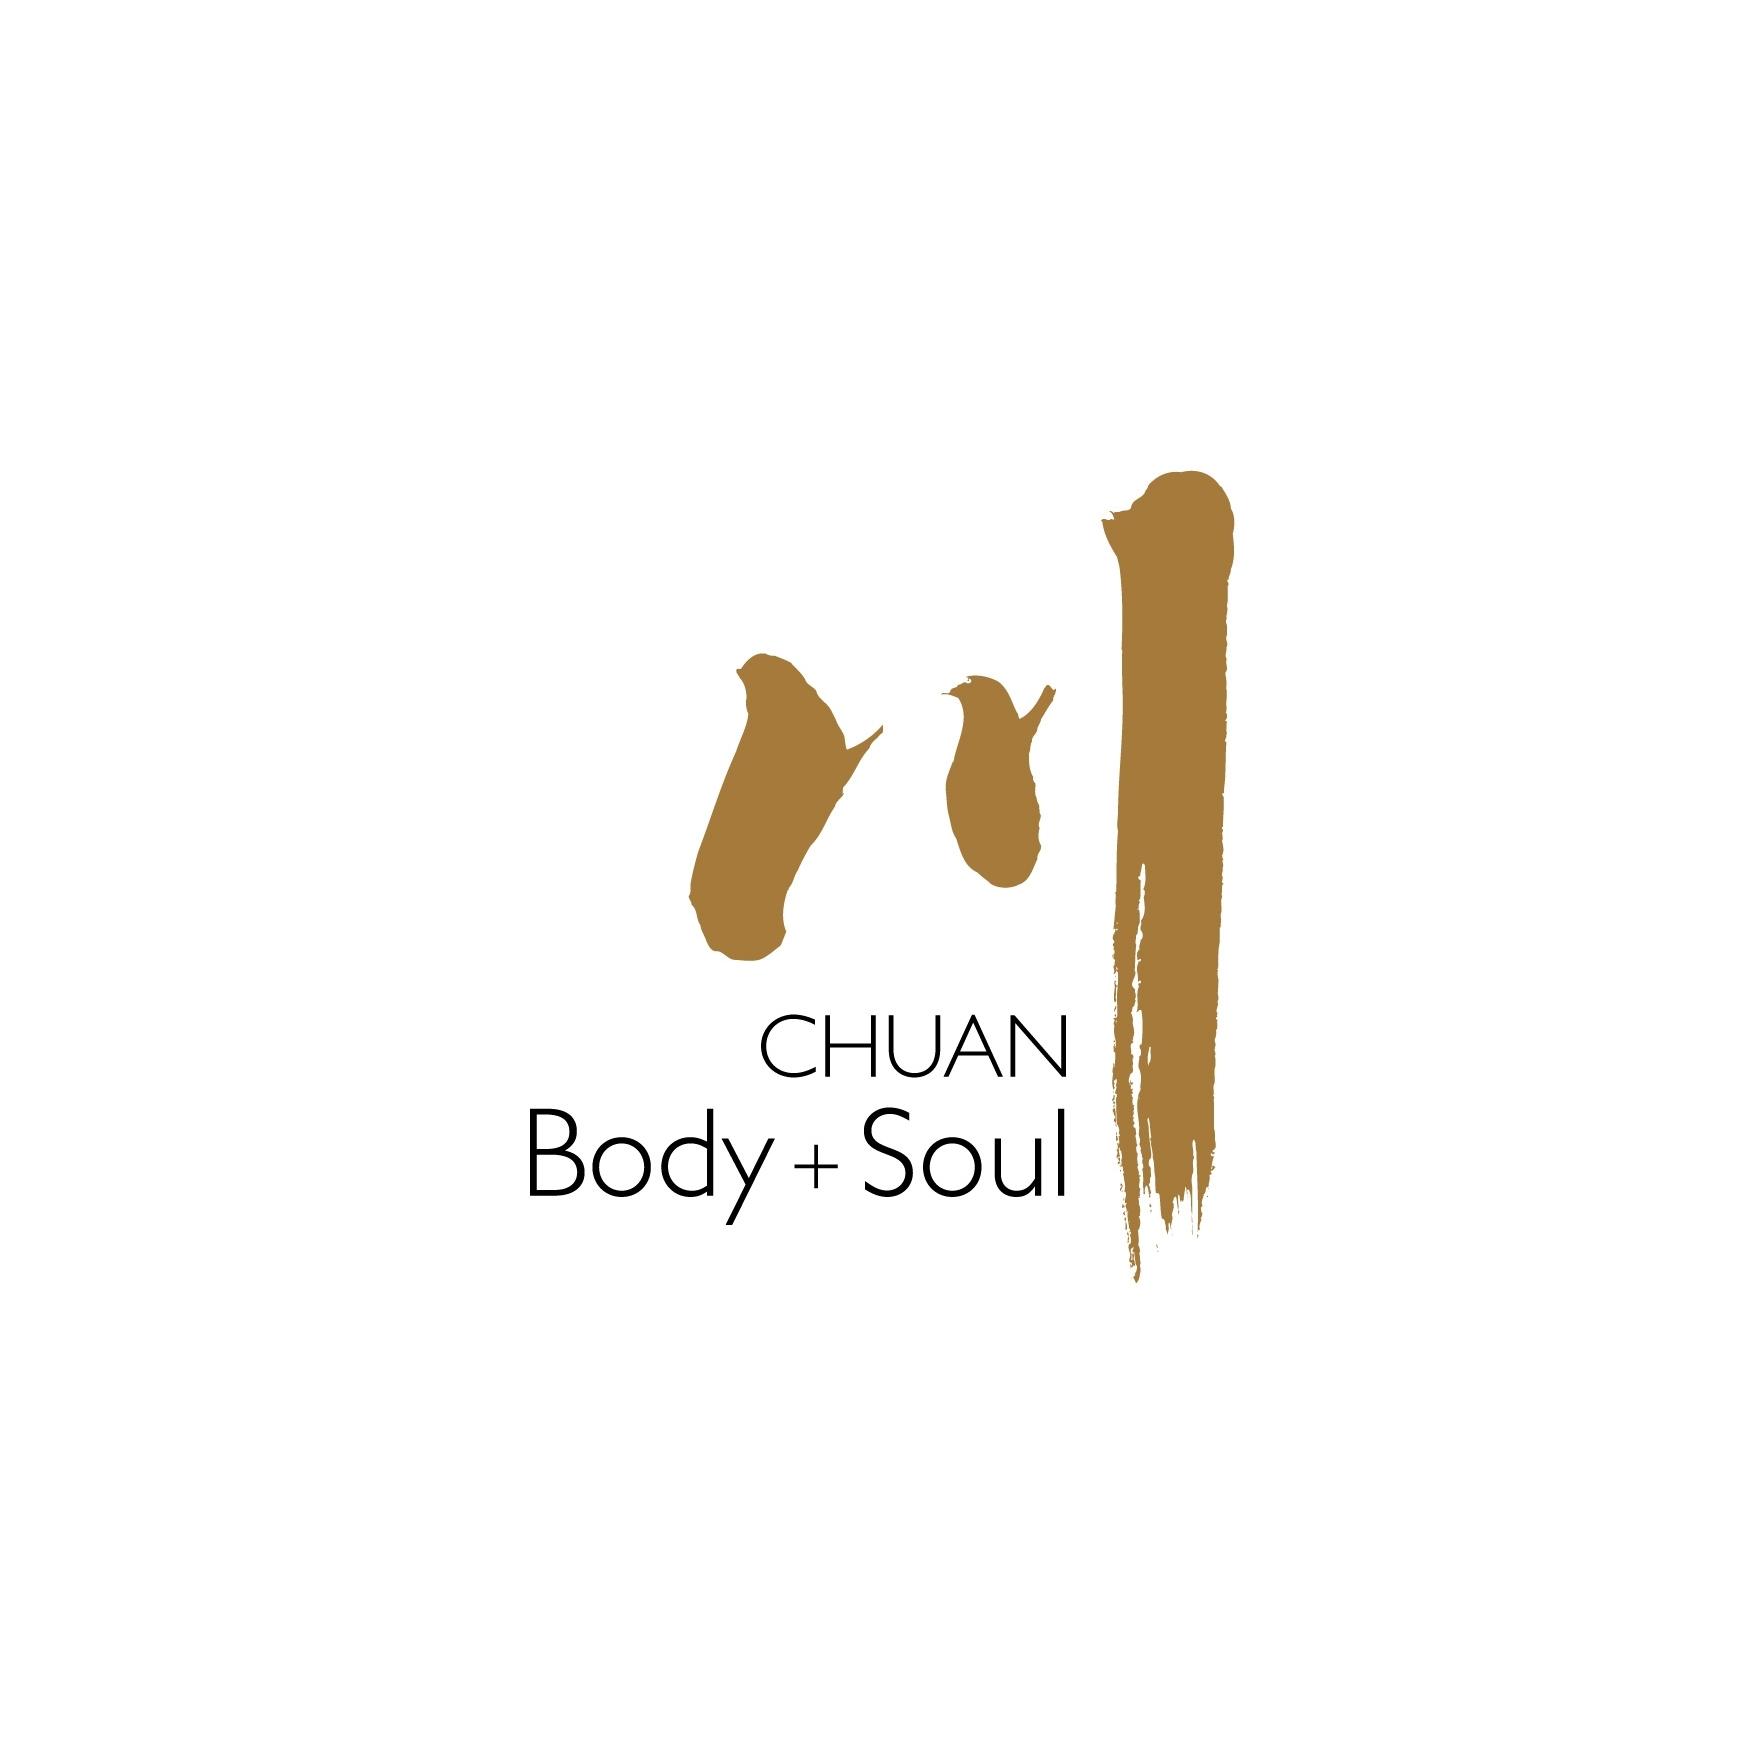 Chuan Body+Soul - London, London W1B 3DE - 020 7973 7550   ShowMeLocal.com